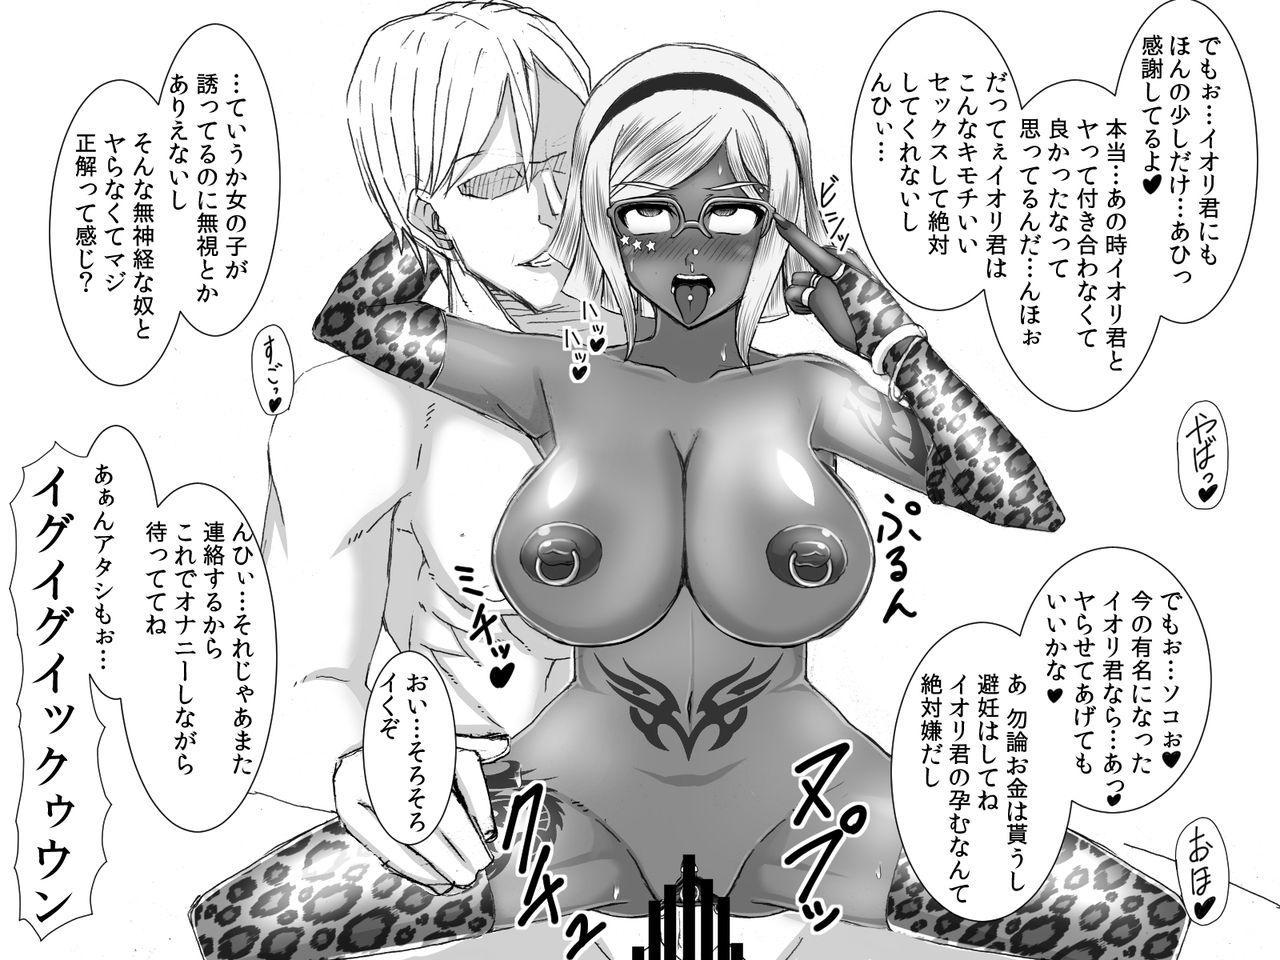 Kusurizuke! Sennou! Kikai Kaizou! Kuroochi Bitch-ka Heroine +α 196